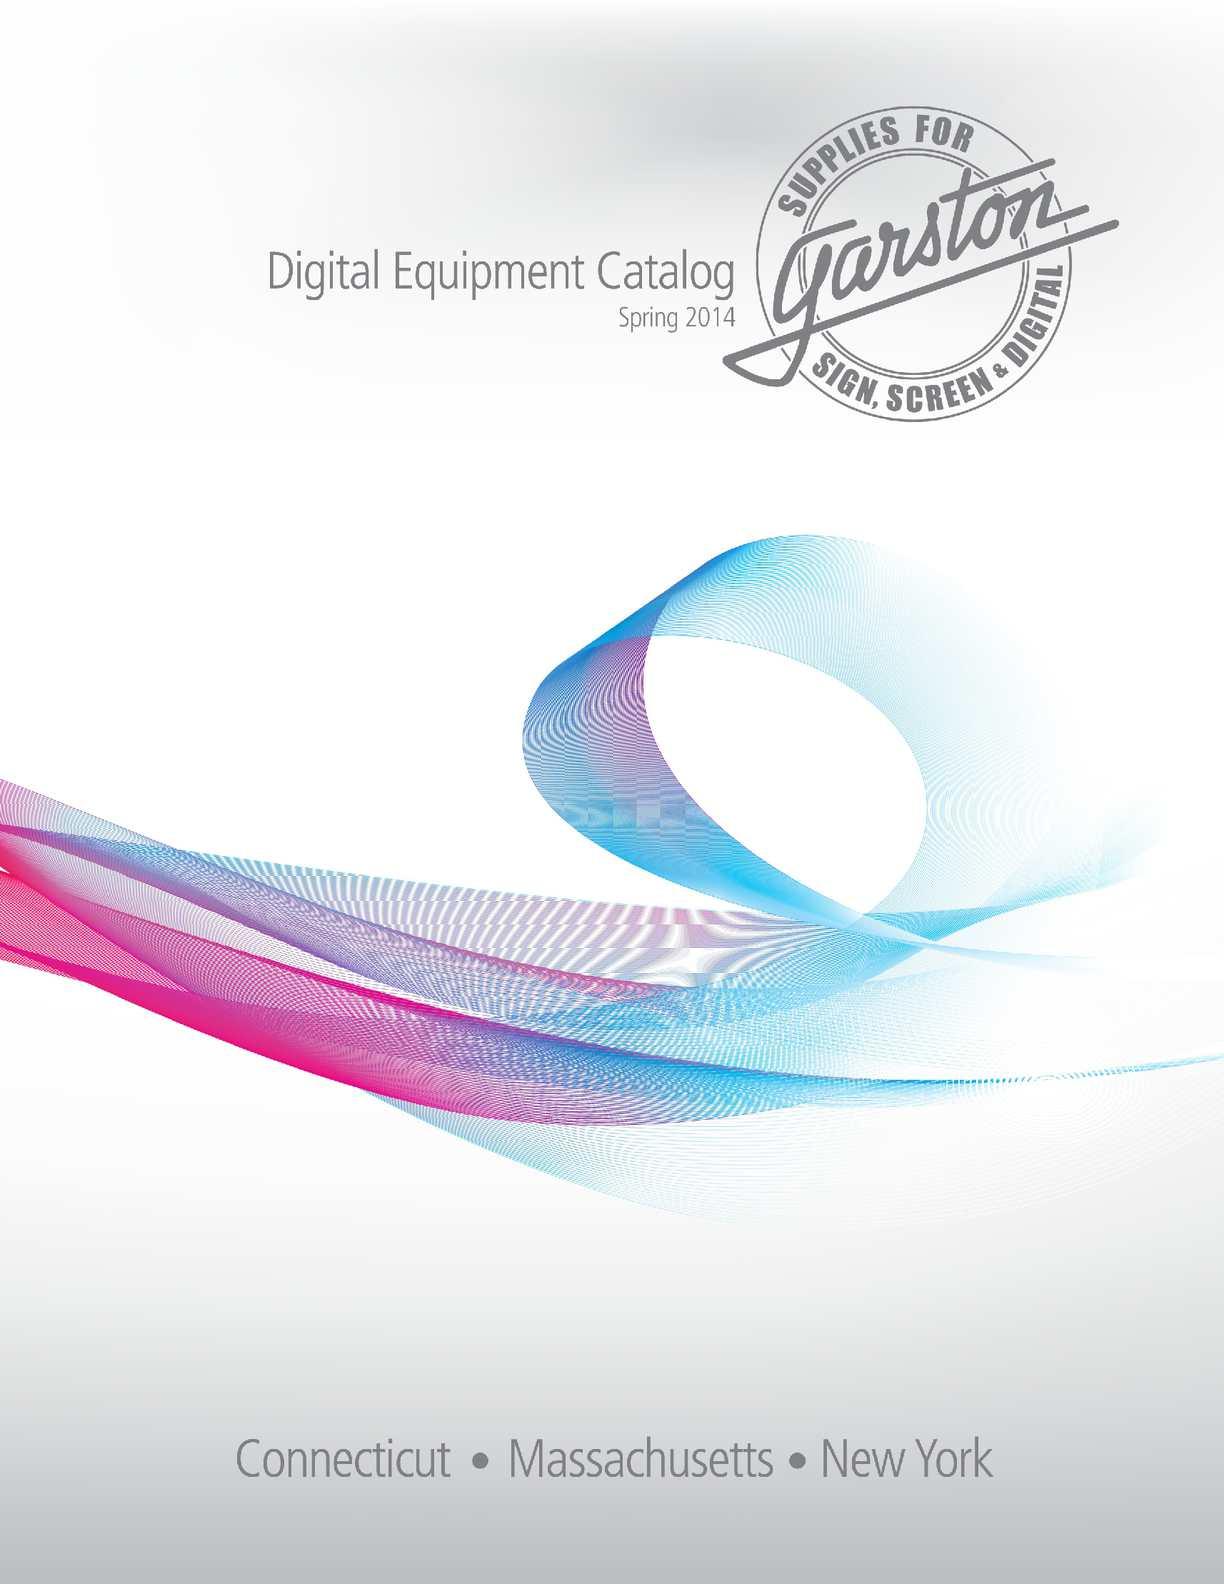 Calaméo - Garston Equipment Digital Catalog Spring 2014